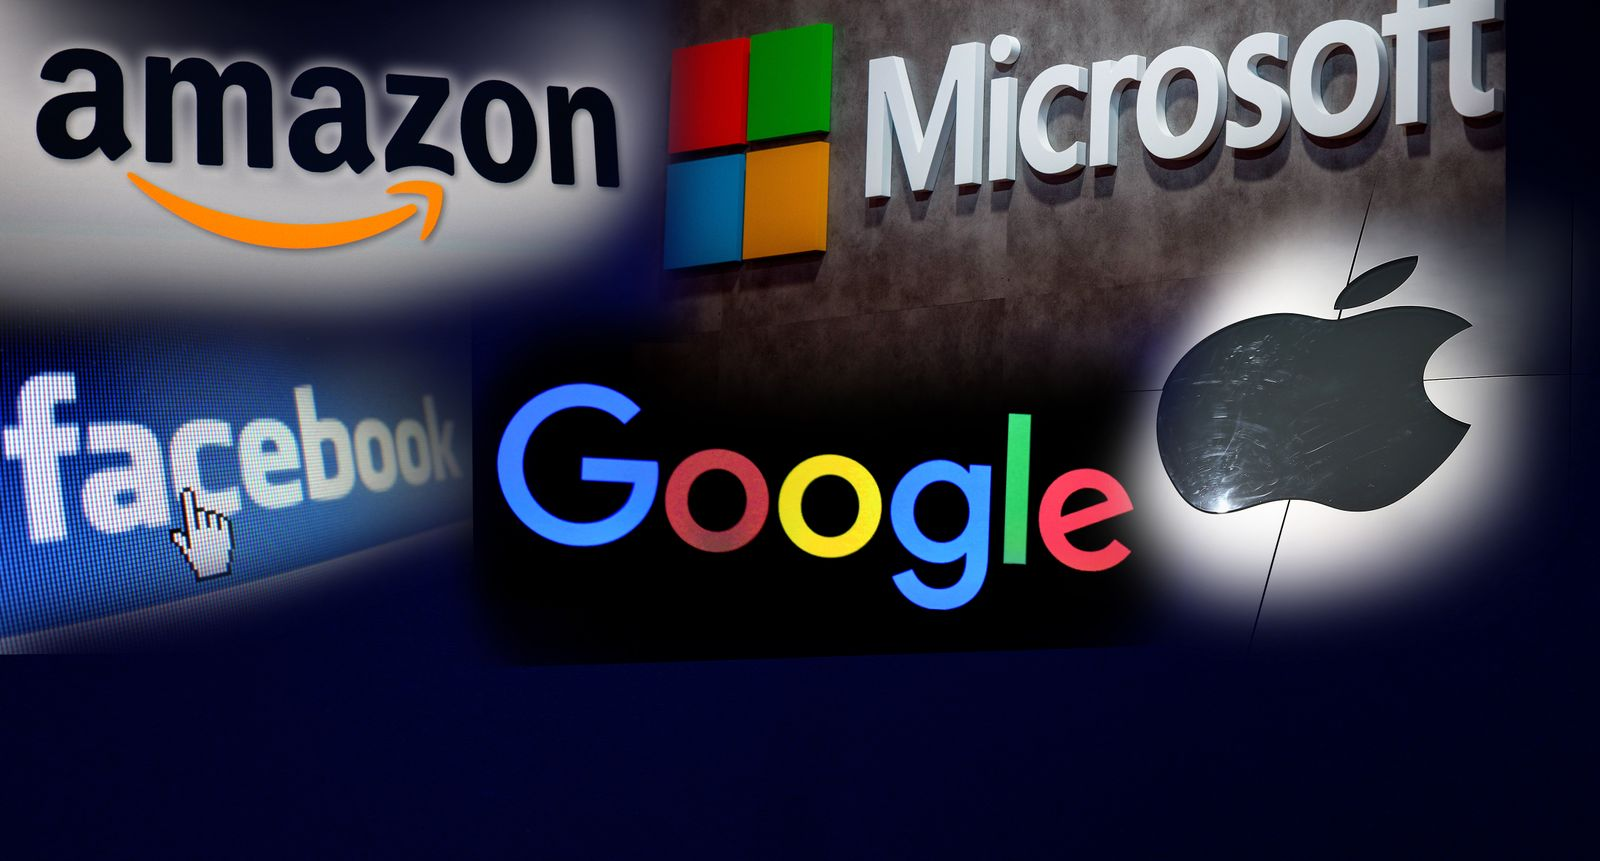 mazon /Microsoft / Google / Facebook / Apple